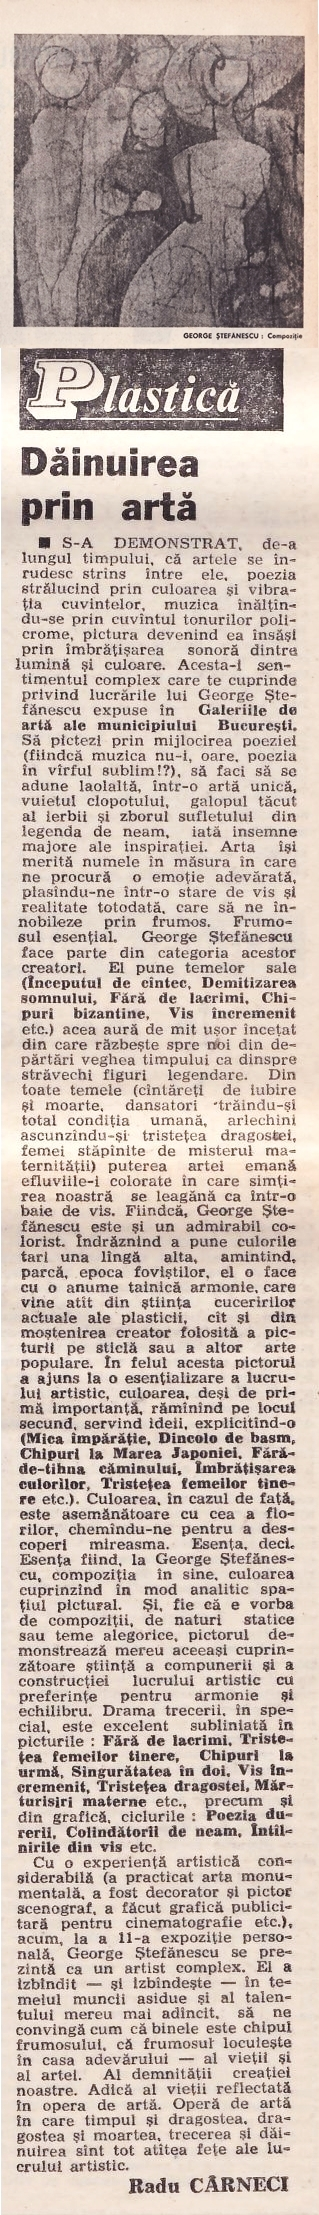 1983 RC PRO